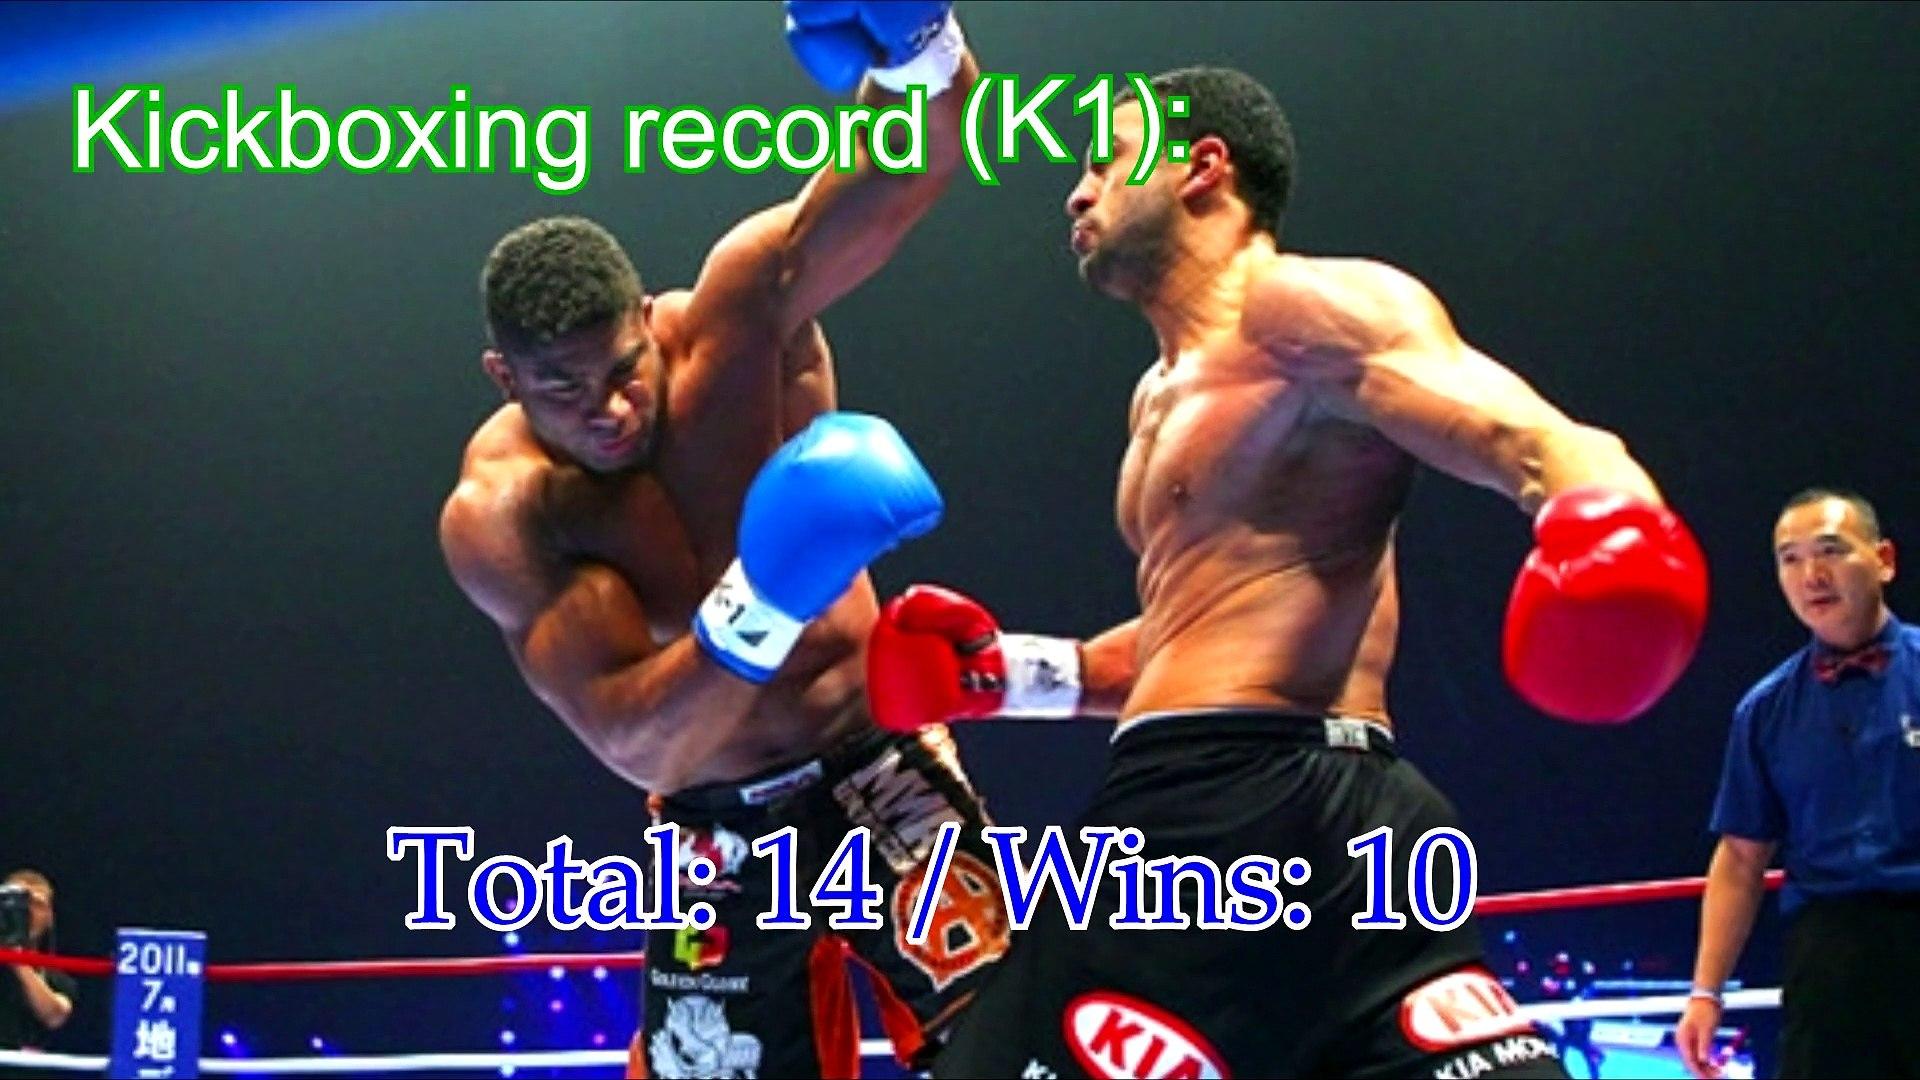 Alistair Overeem Losses In K1 Kickboxing Fights